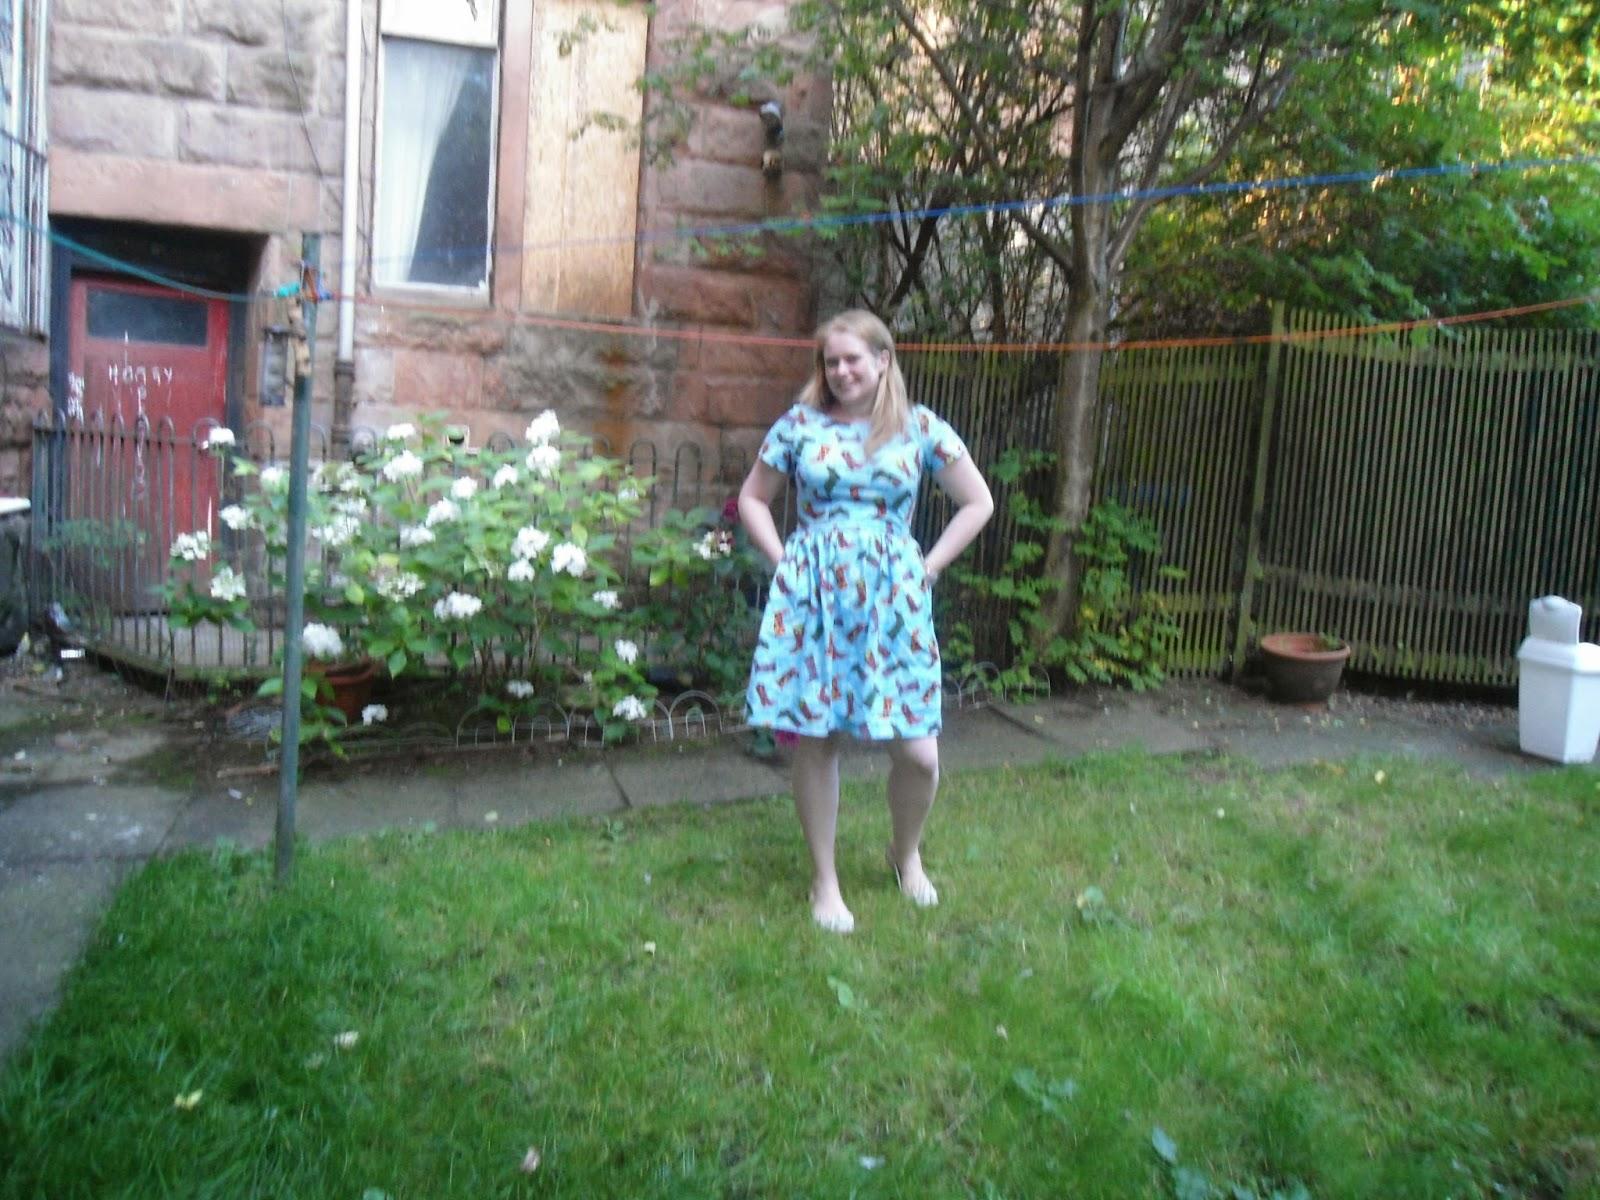 http://jennifercatherineshaw.blogspot.com/2014/09/completed-emery-dress-no-2.html